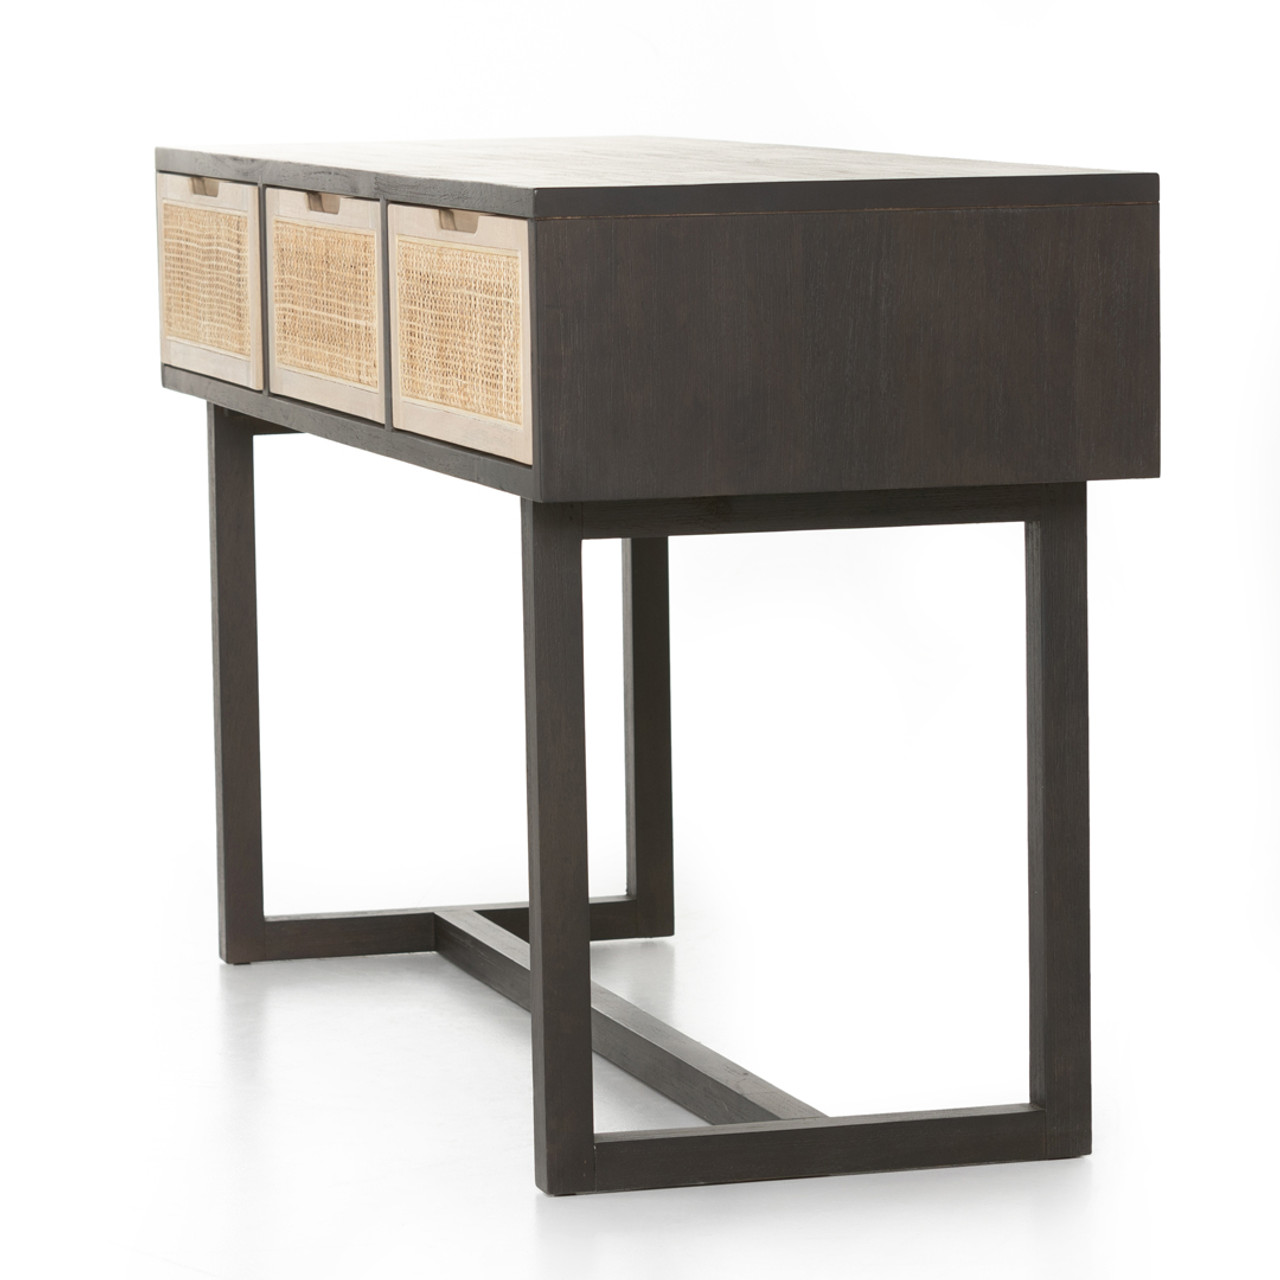 Brisbane Cane Console Table